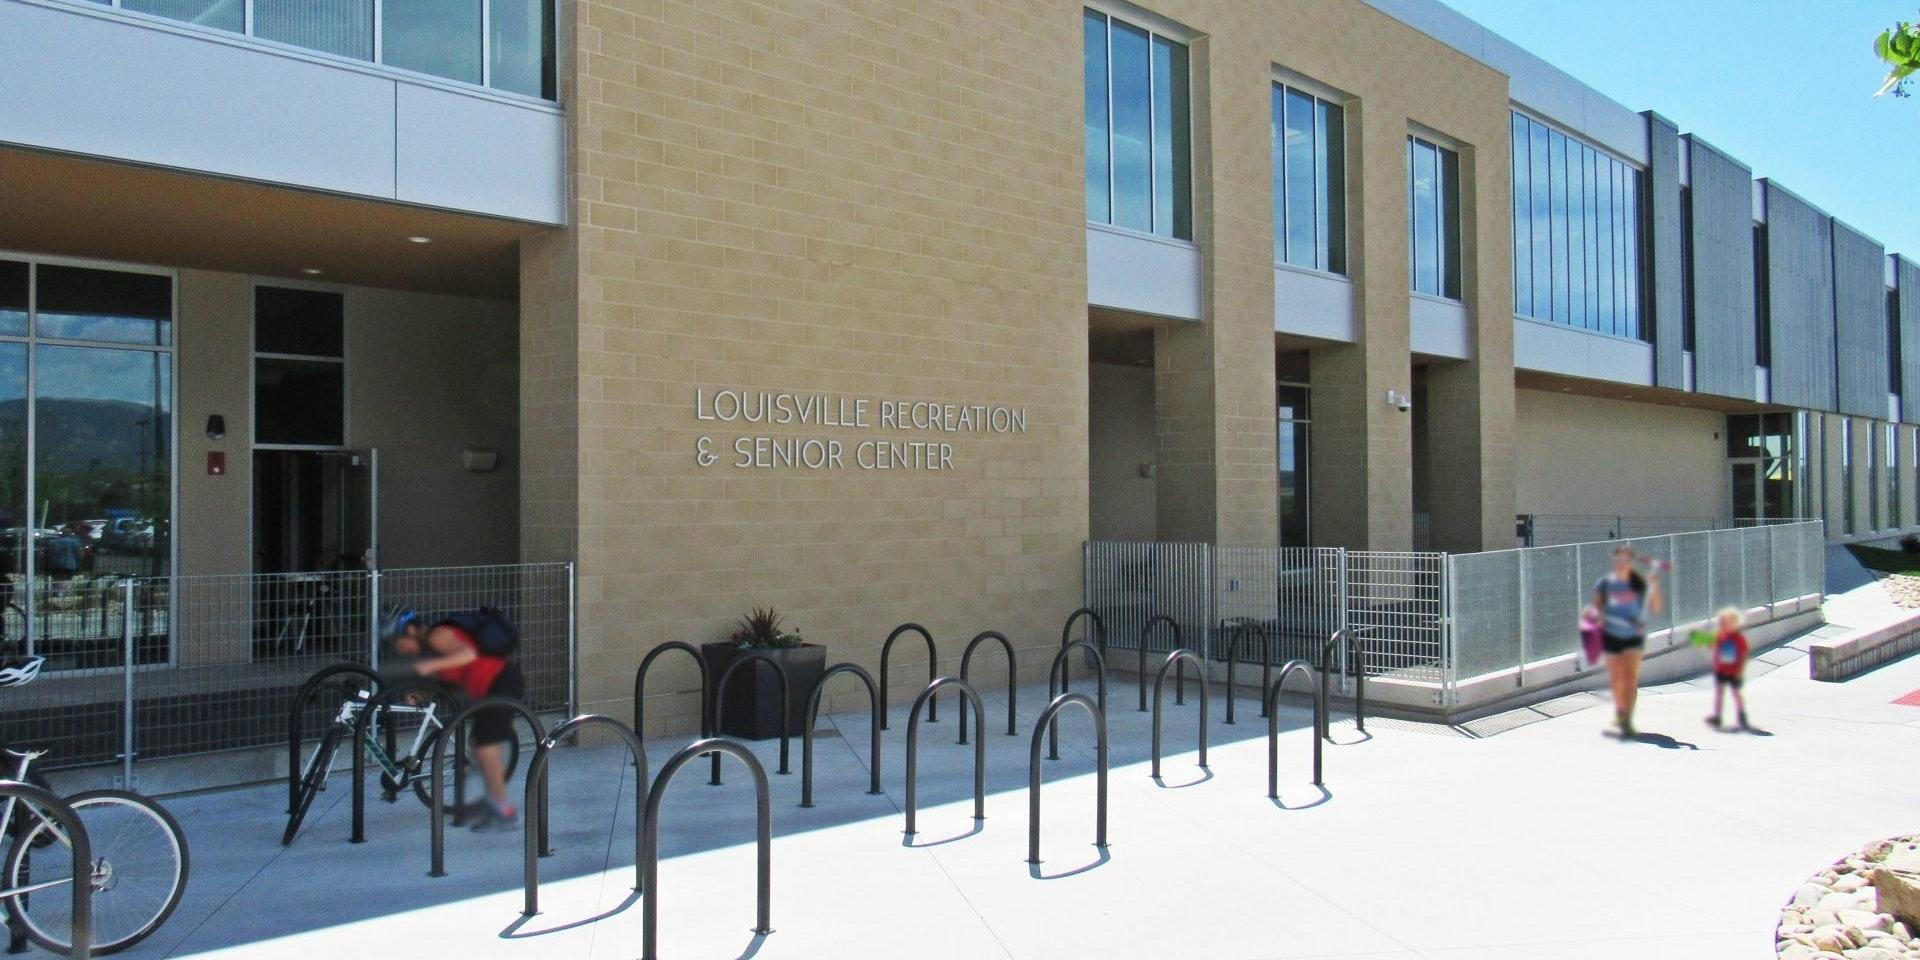 Louisville Recreation & Senior Center